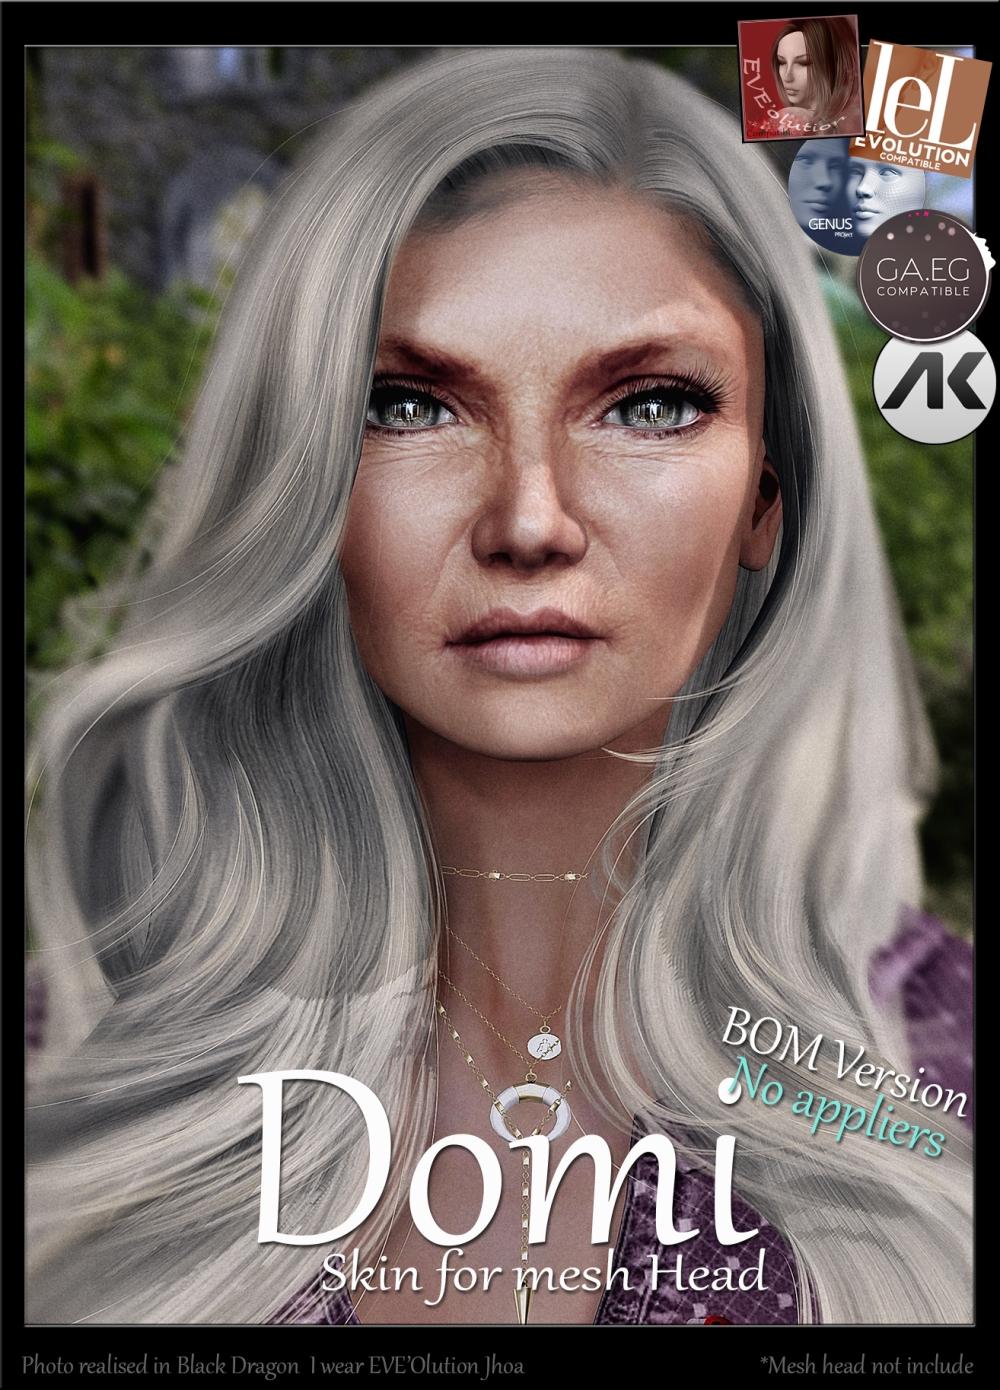 10-Domi pour skin eve-olution